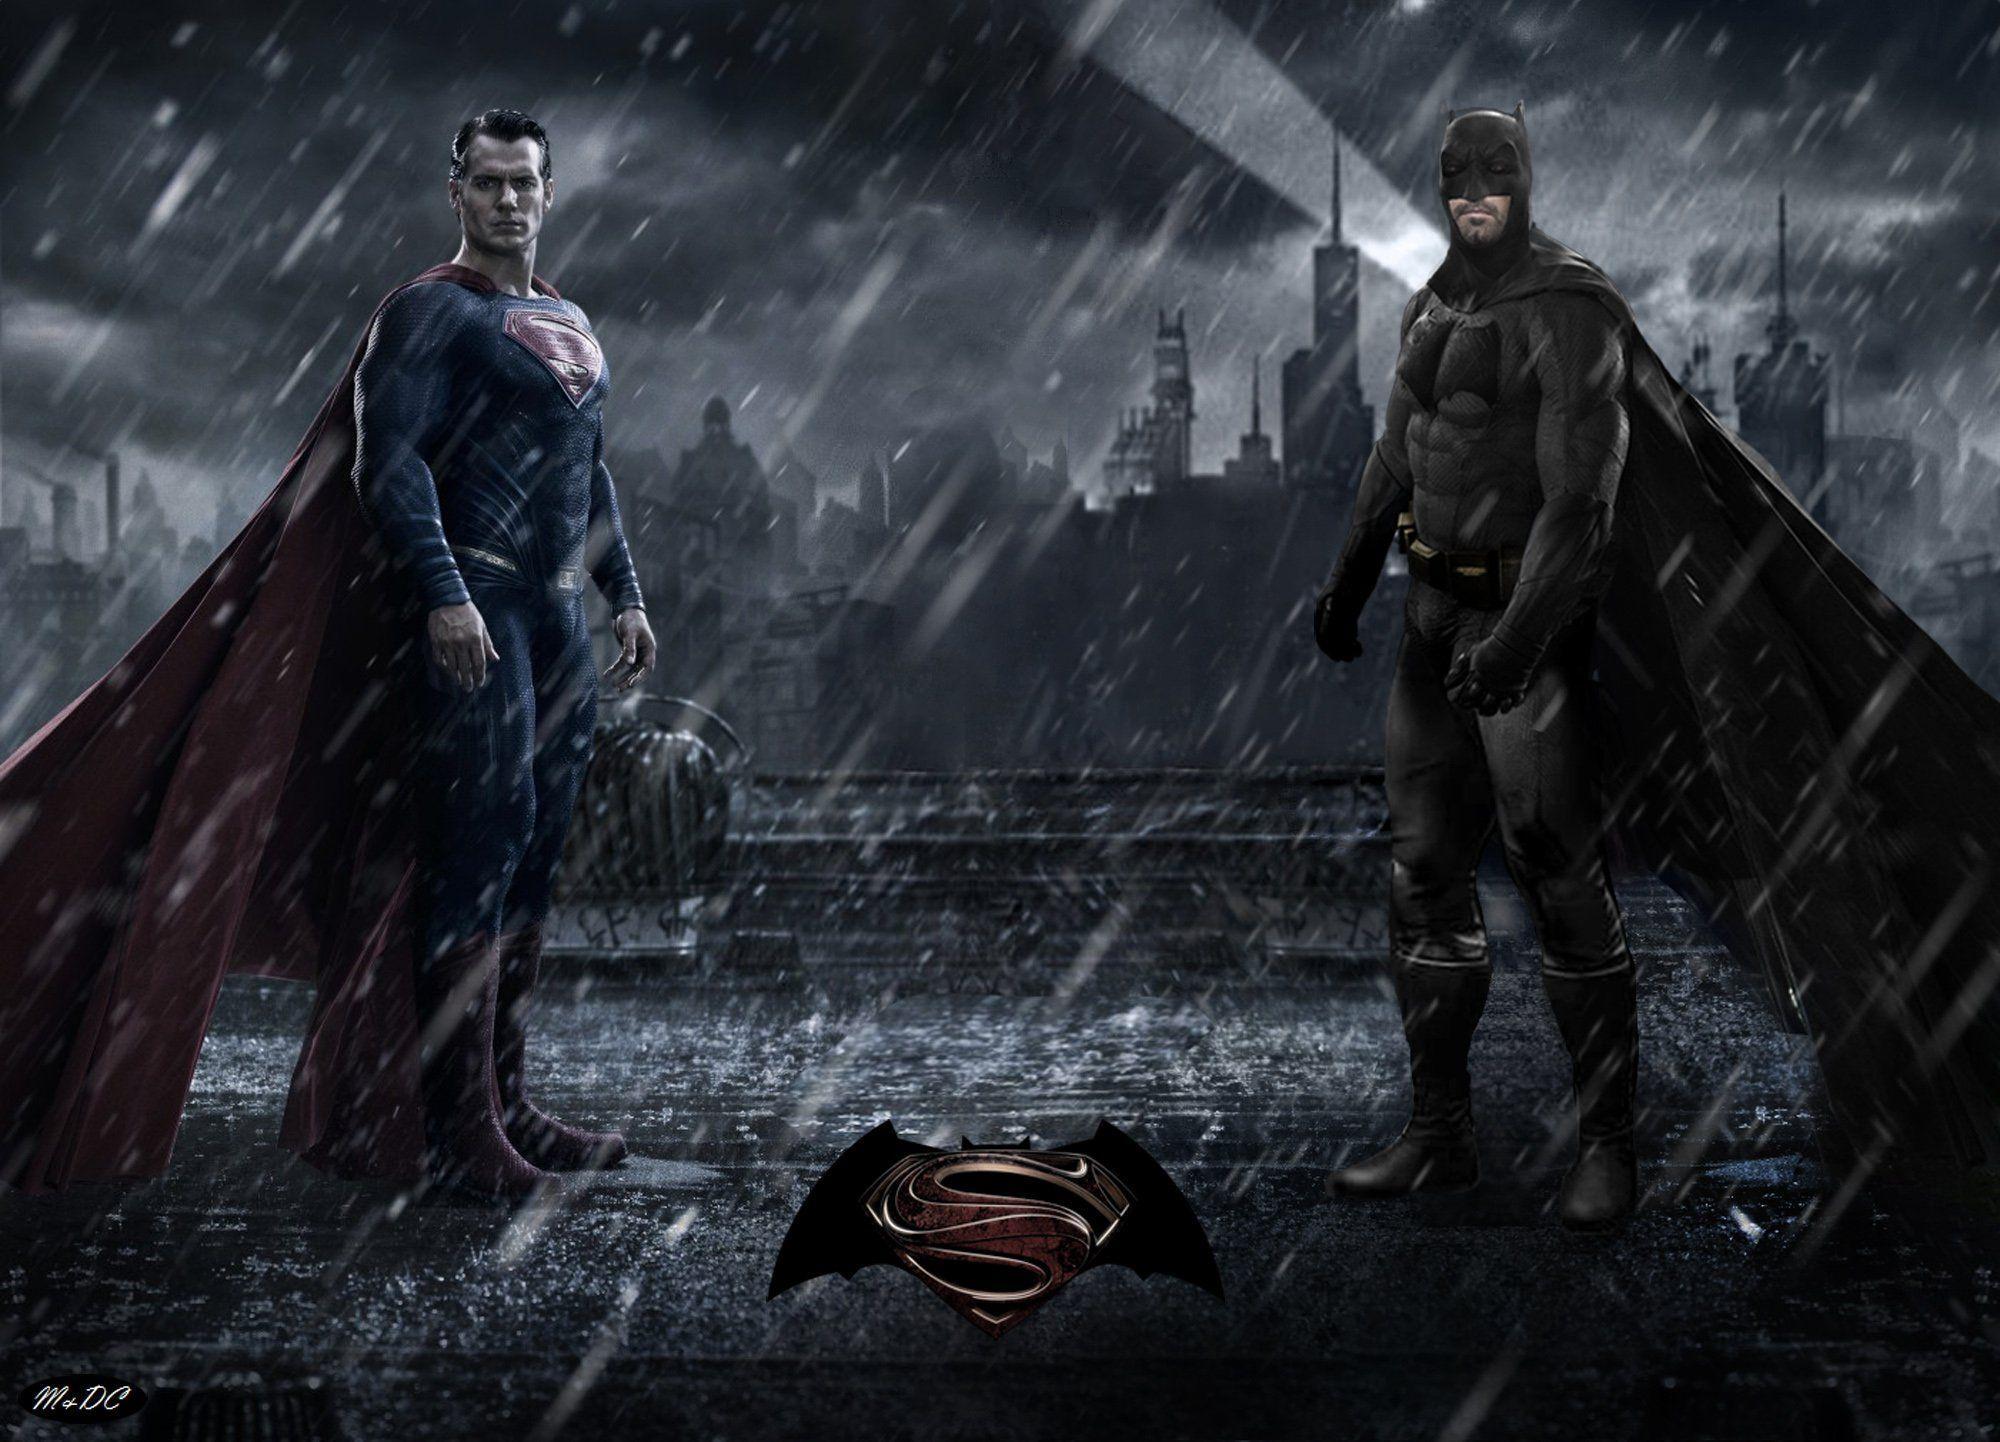 batman vs superman full movie download hd